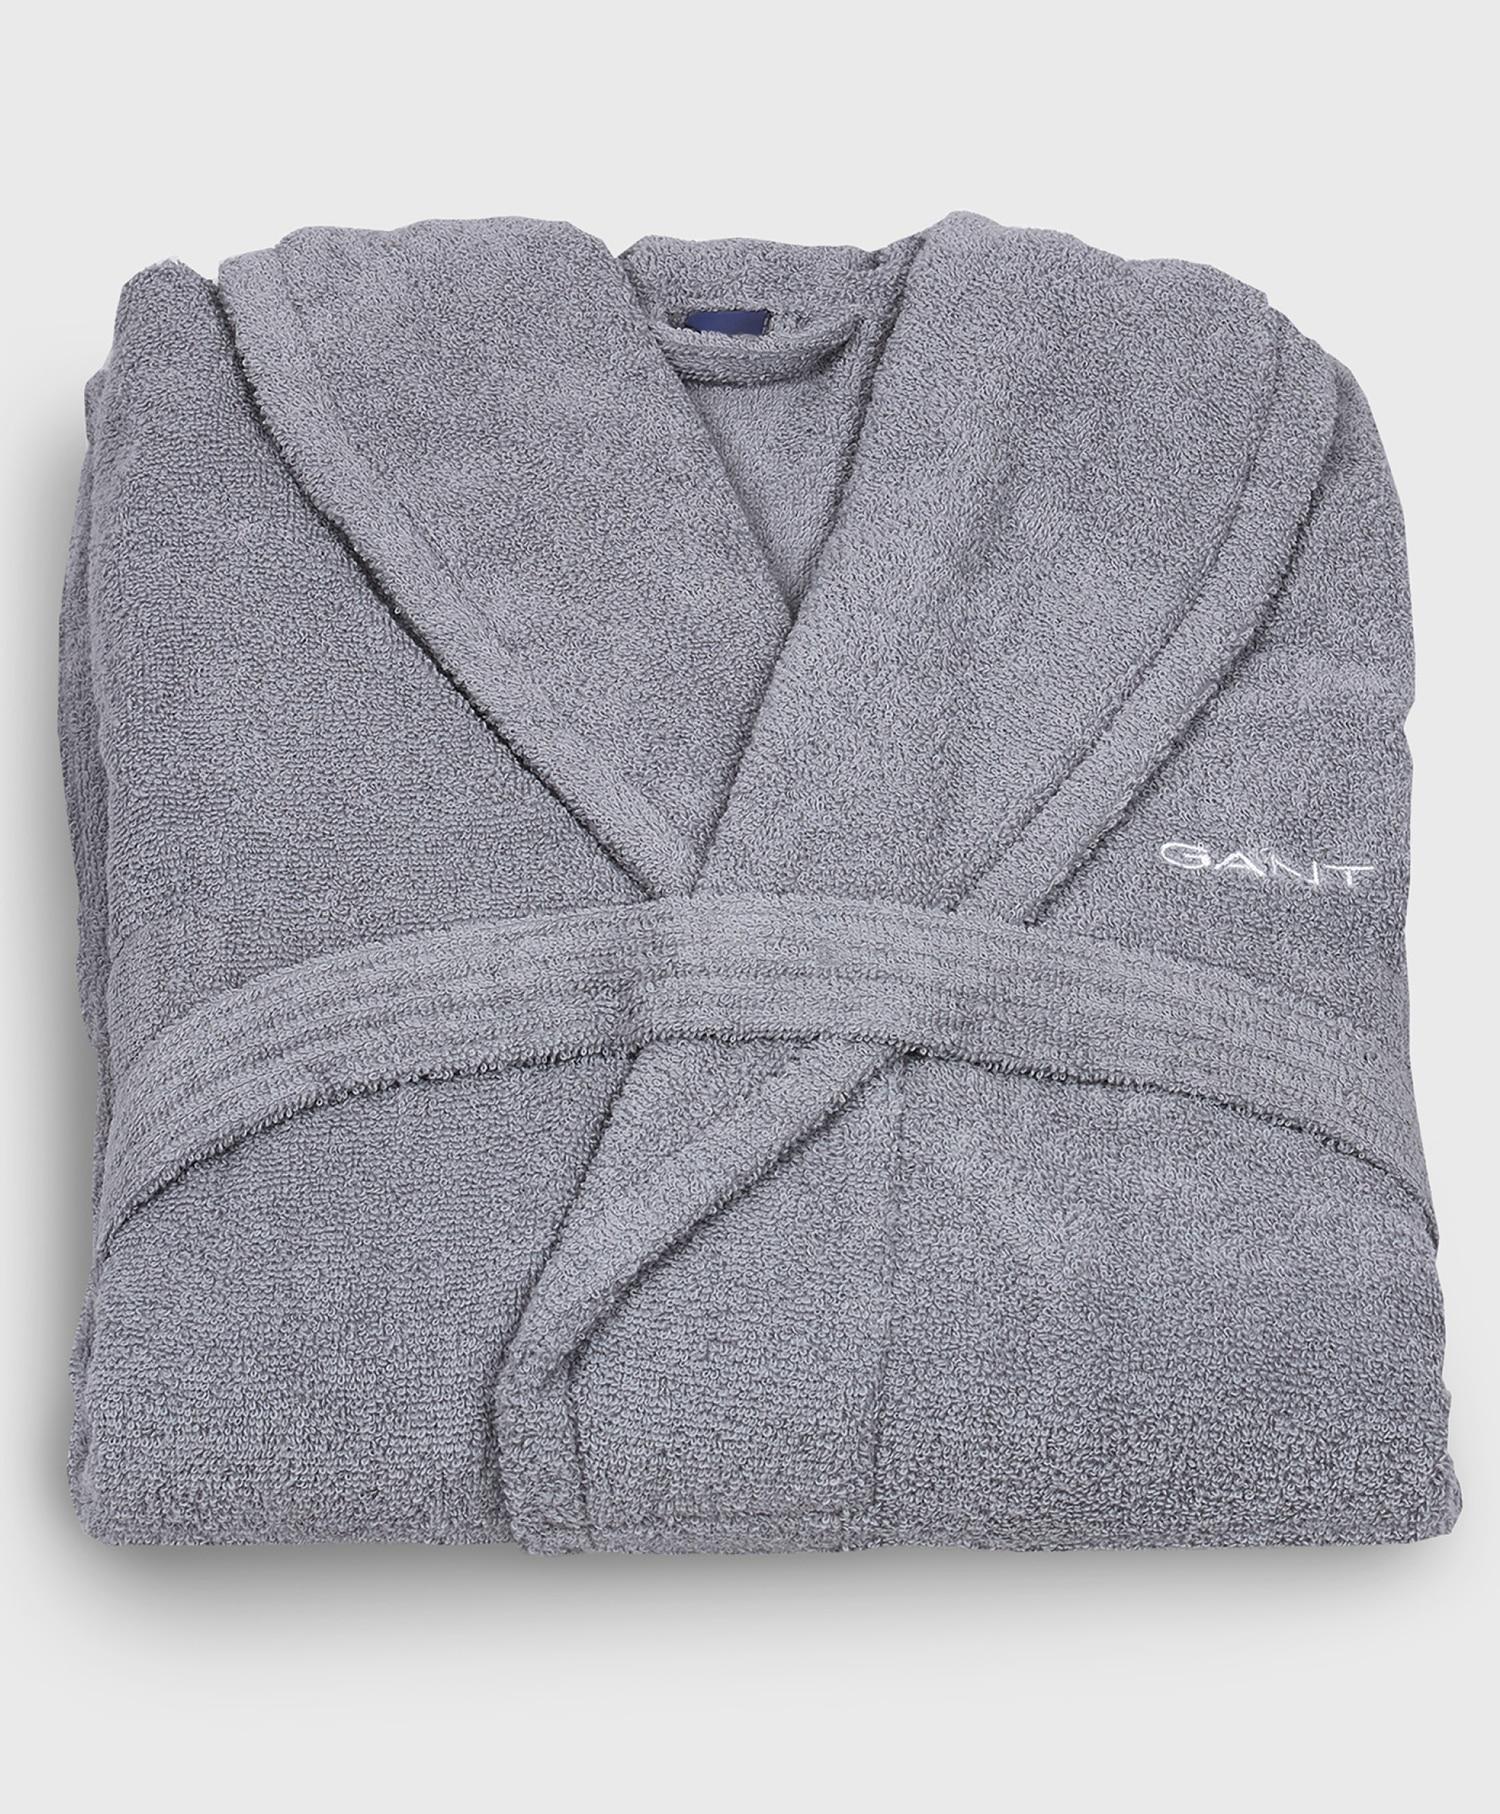 Gant Terry badekåpe